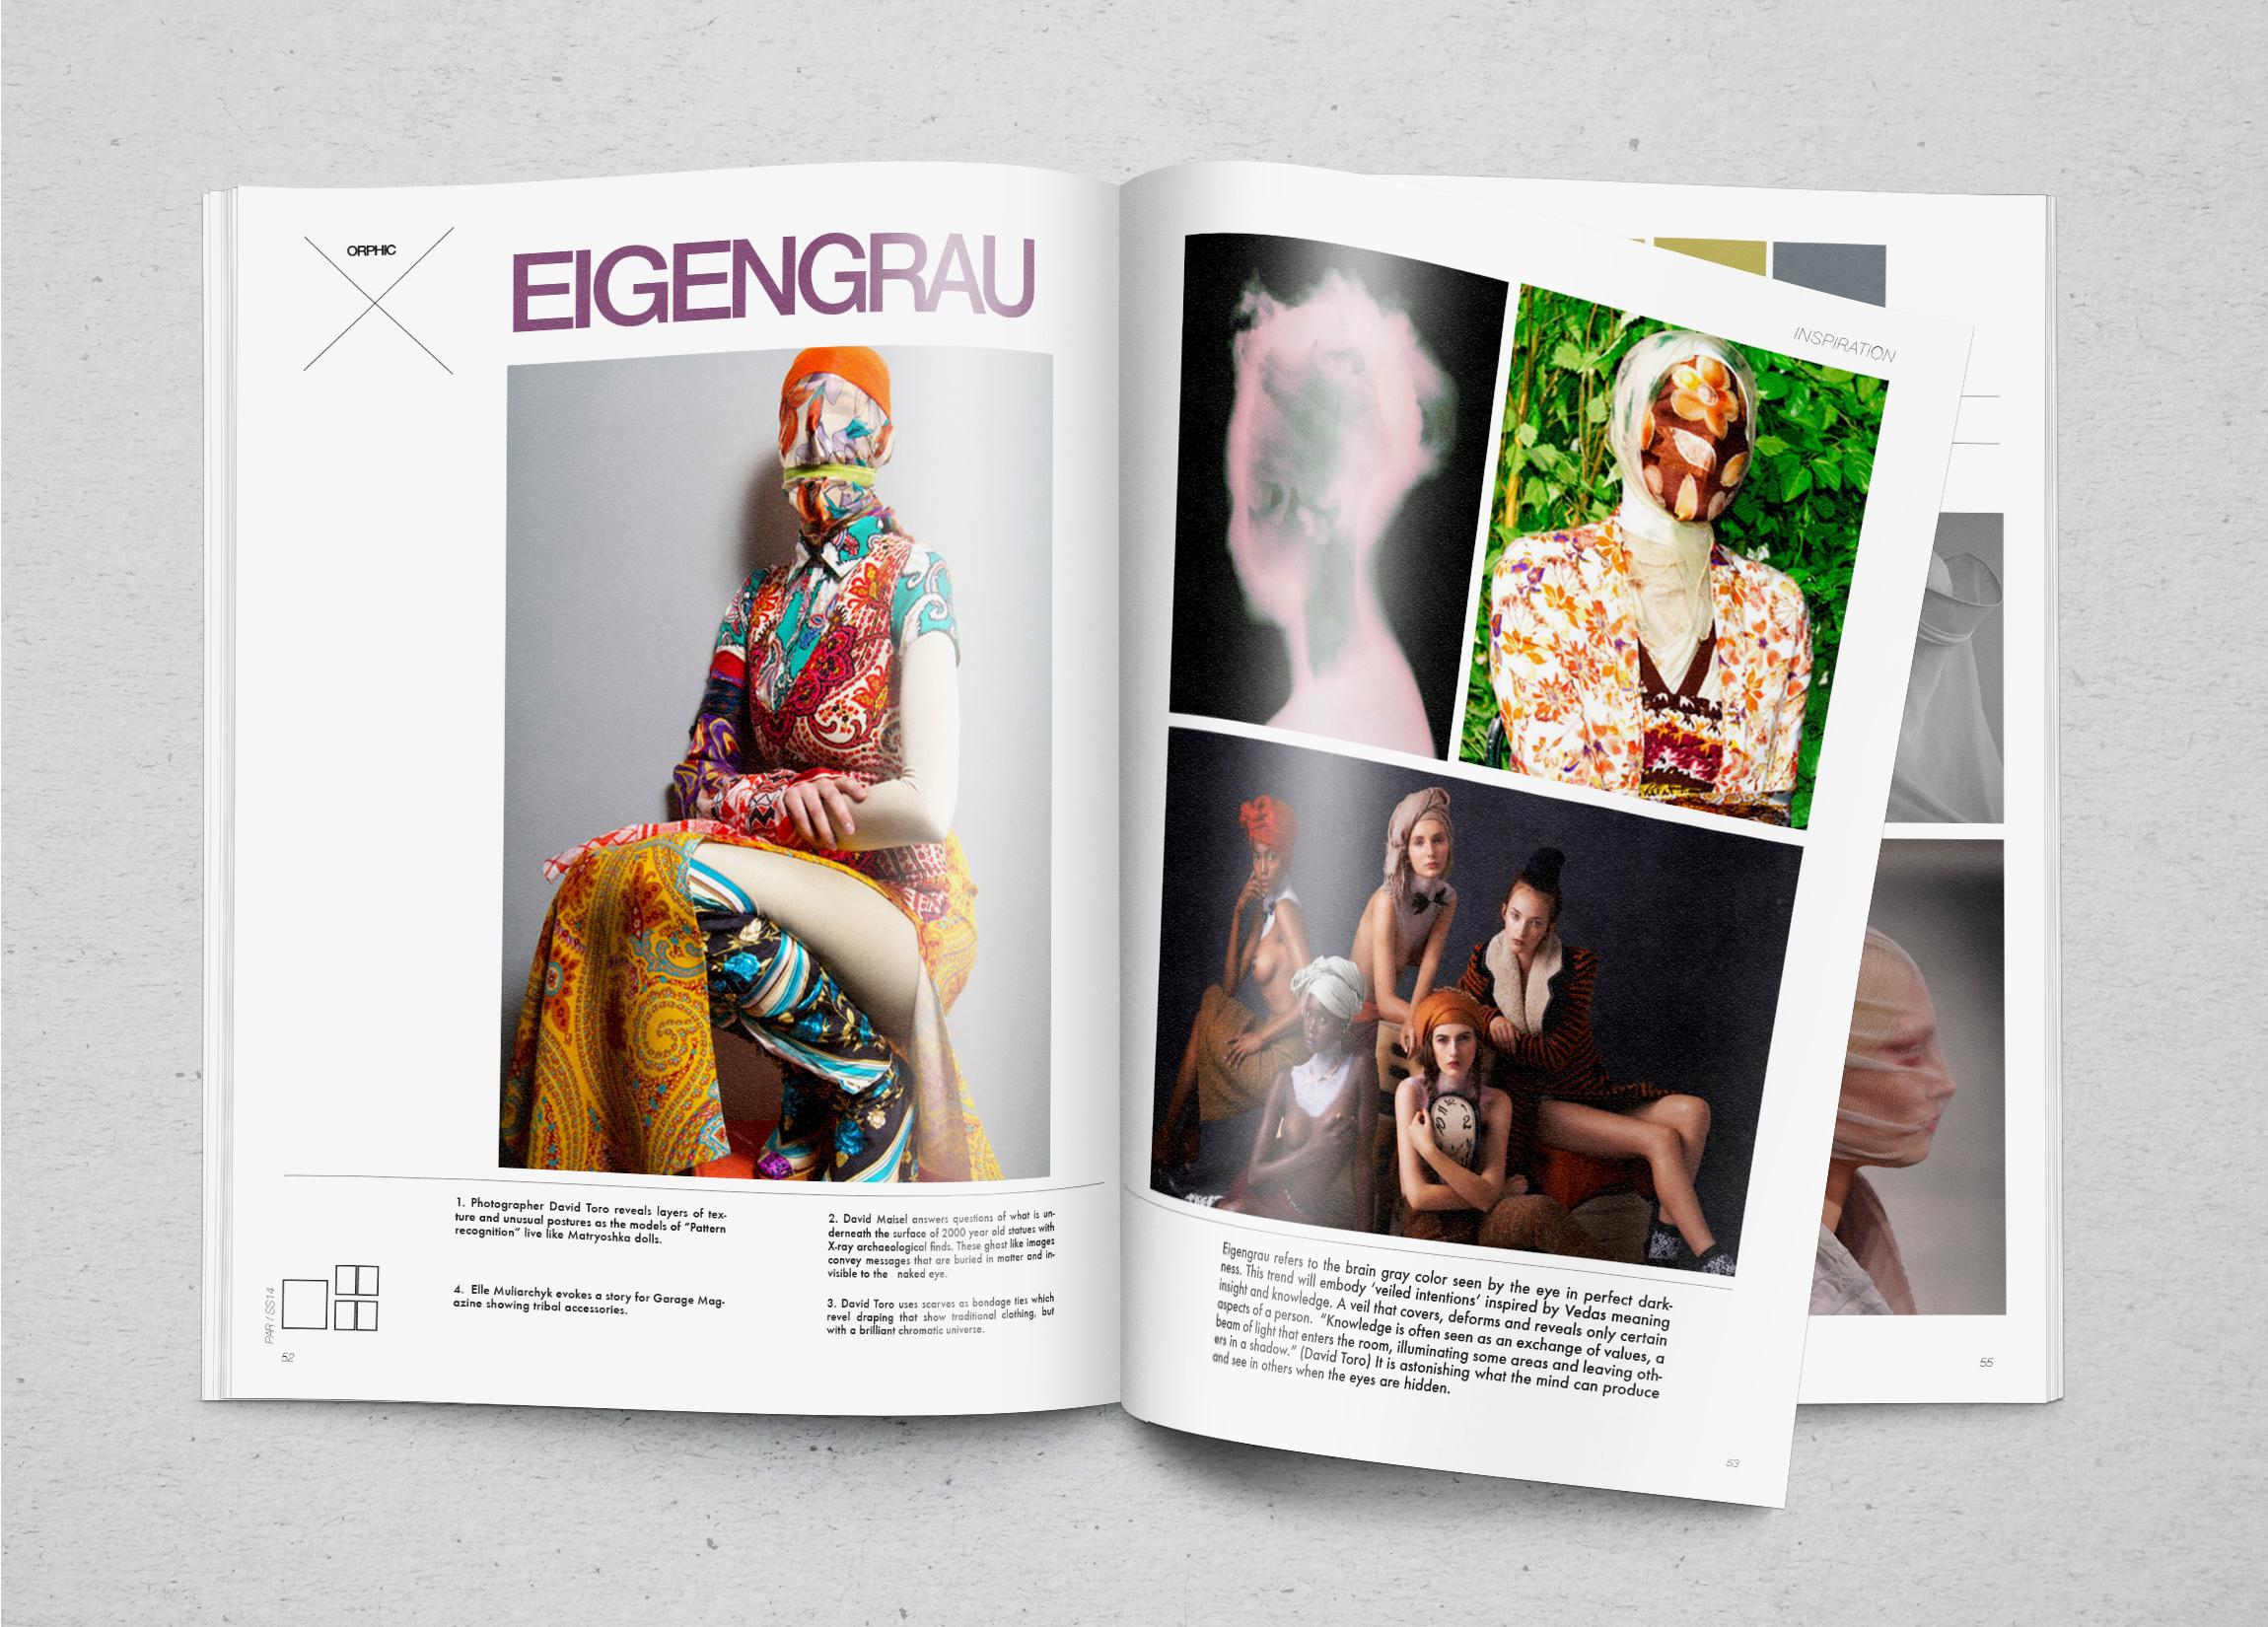 PARd_5Photorealistic Magazine MockUp.jpg